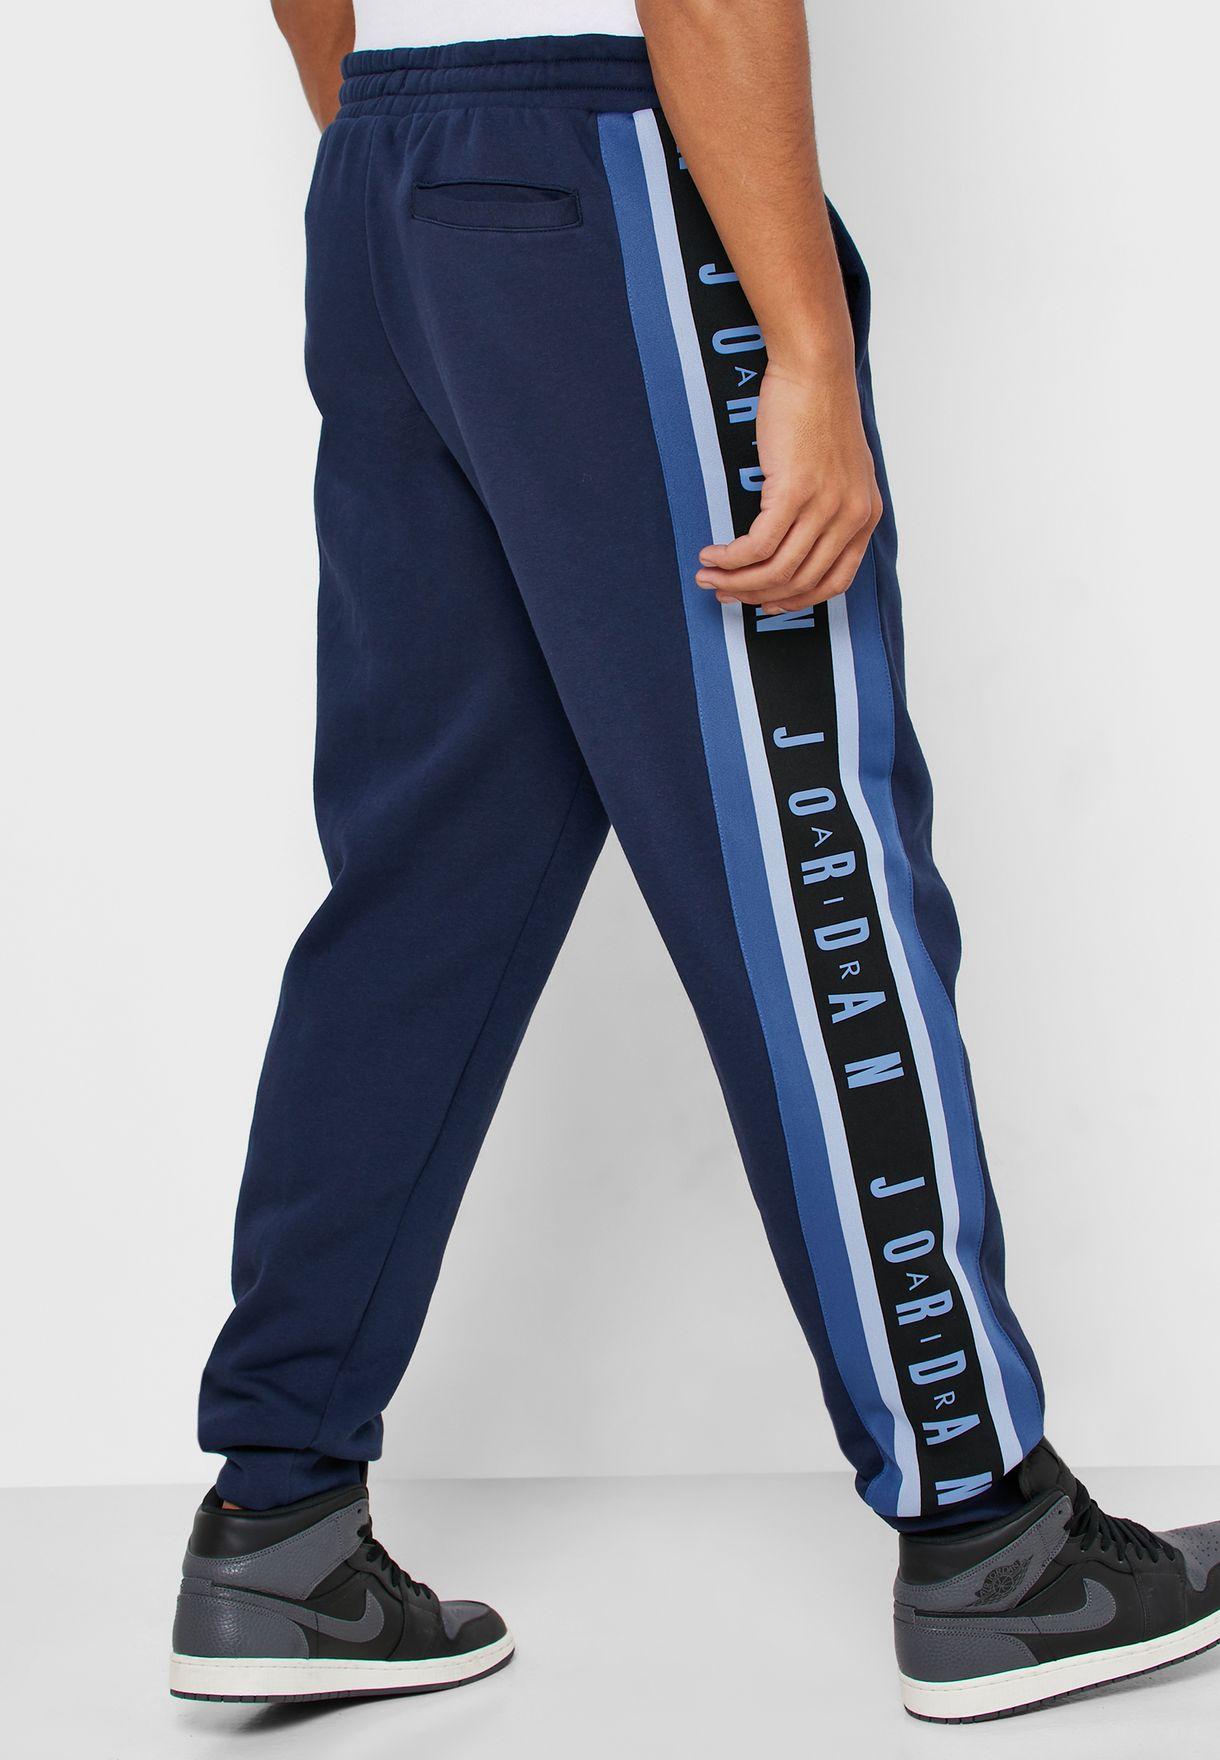 Air Jordan Gradient Fleece Sweatpants